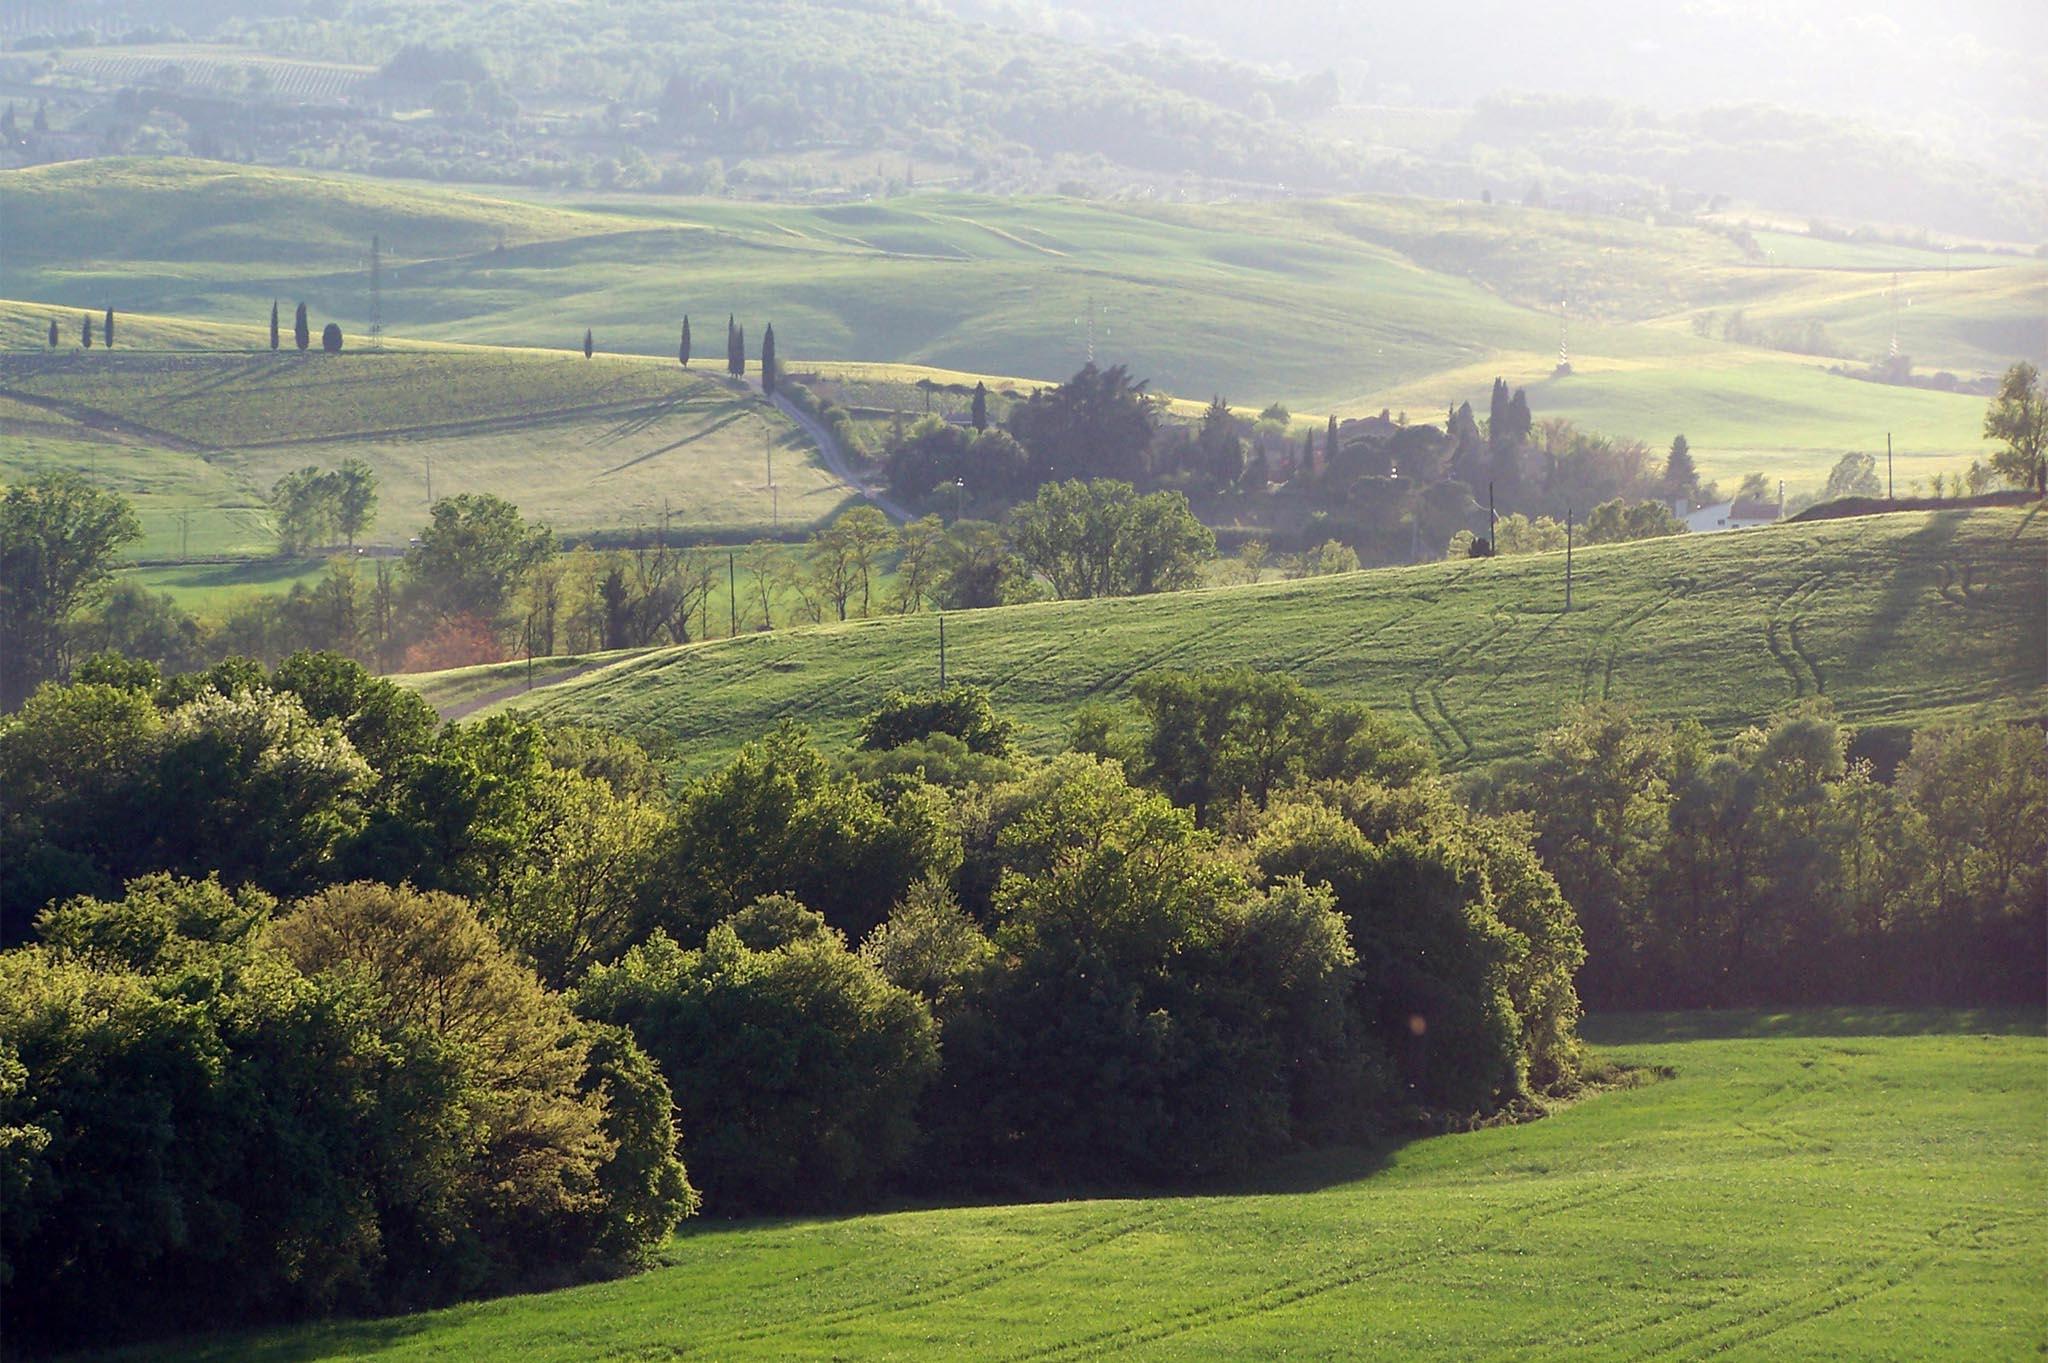 Maremma Real Estate, Property for Sale Tuscany, Italy Sotheby's - sothebys.photo 1